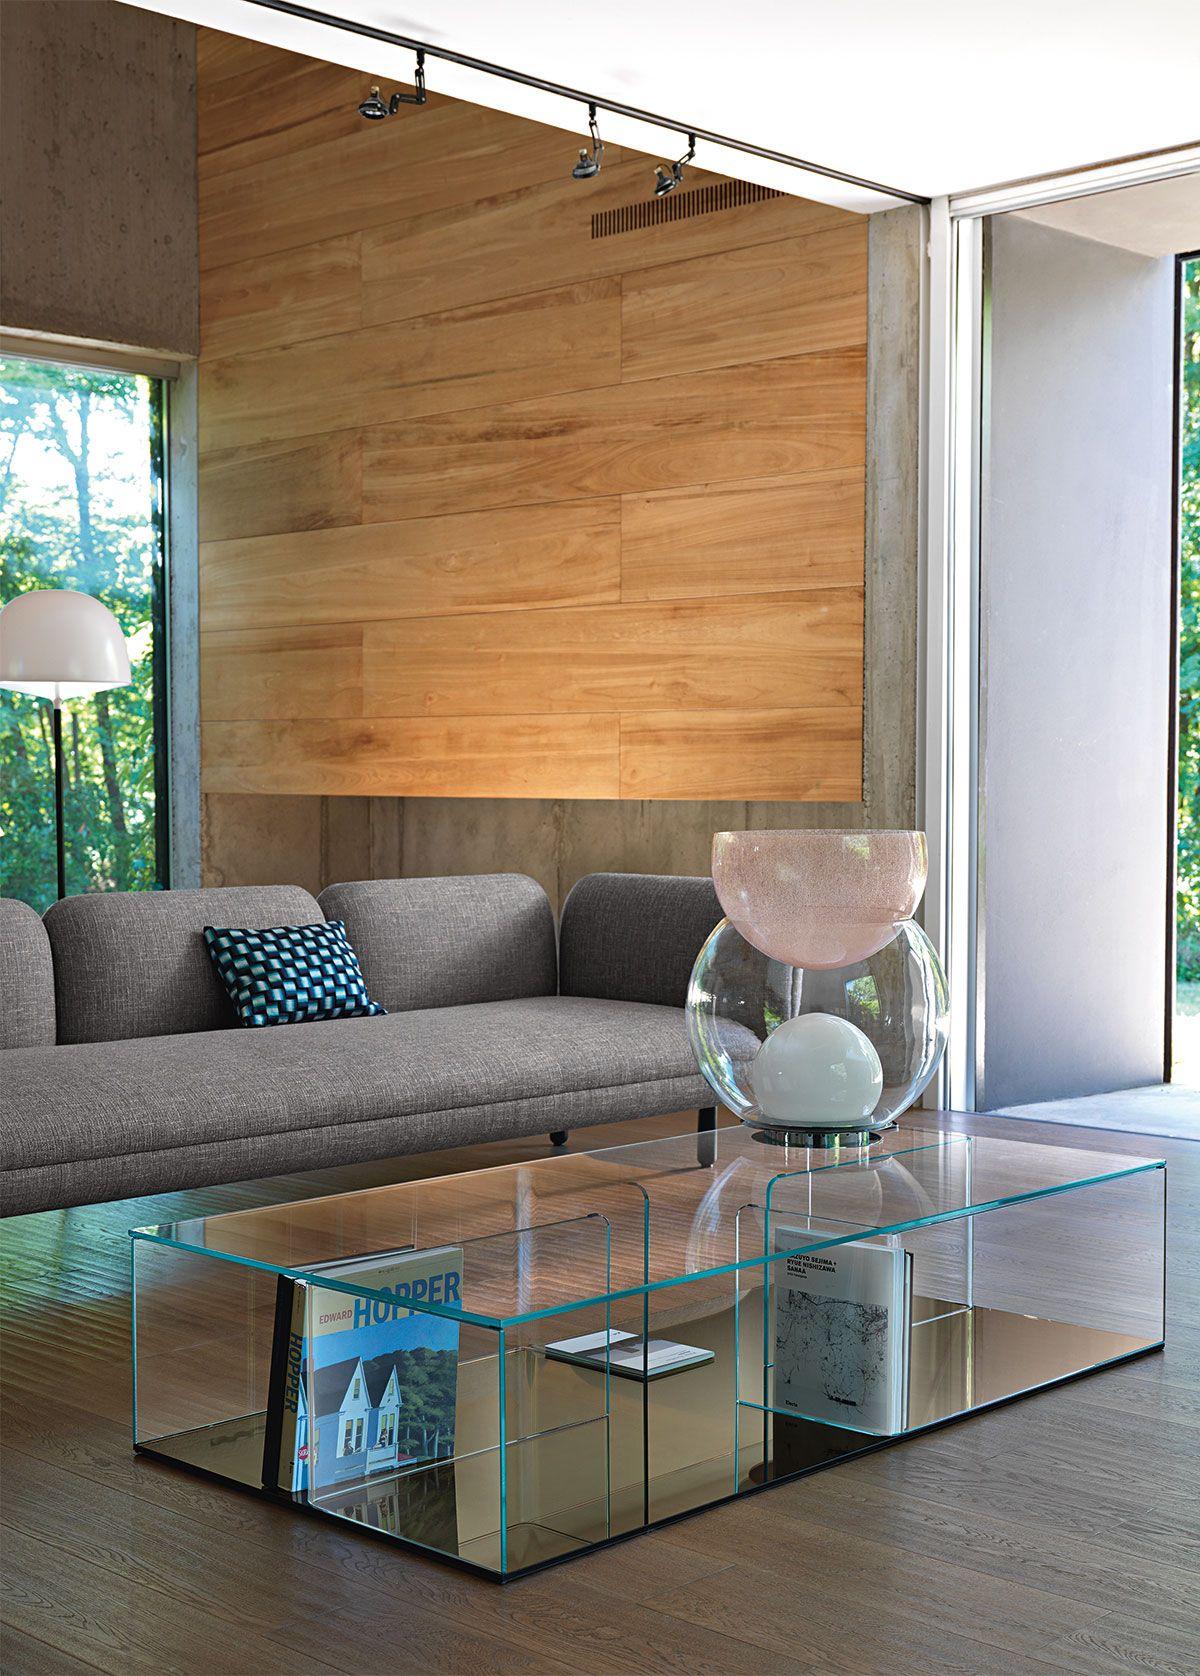 Quadra By Fiam Italia Modern Low Tables Coffee Table Glass Coffee Table Living Room Remodel [ 1676 x 1200 Pixel ]